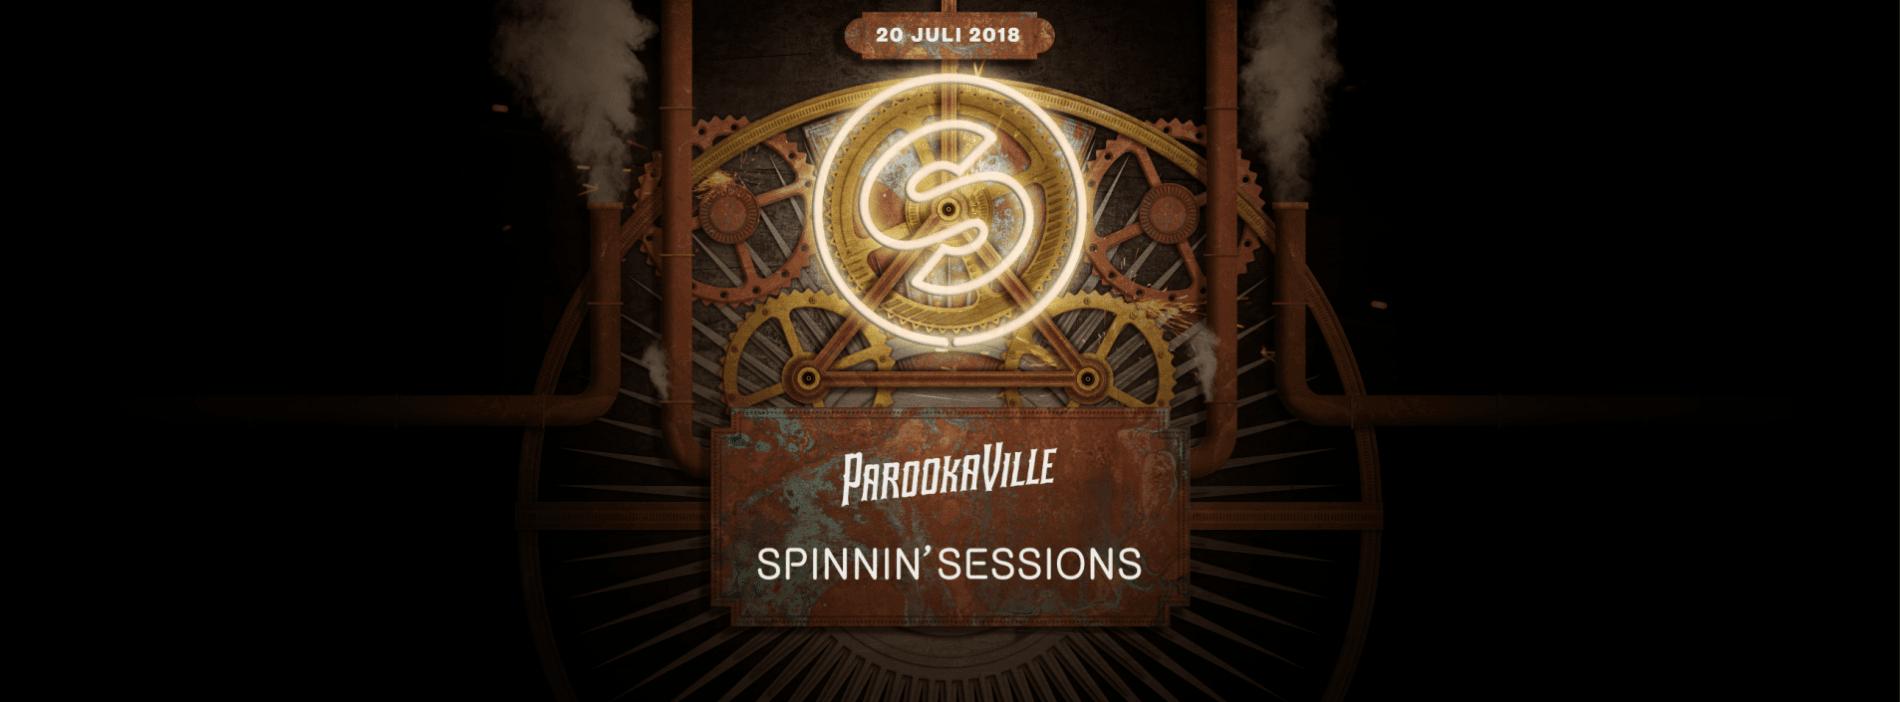 Spinnin' Sessions Spinnin' Sessions | Parookaville